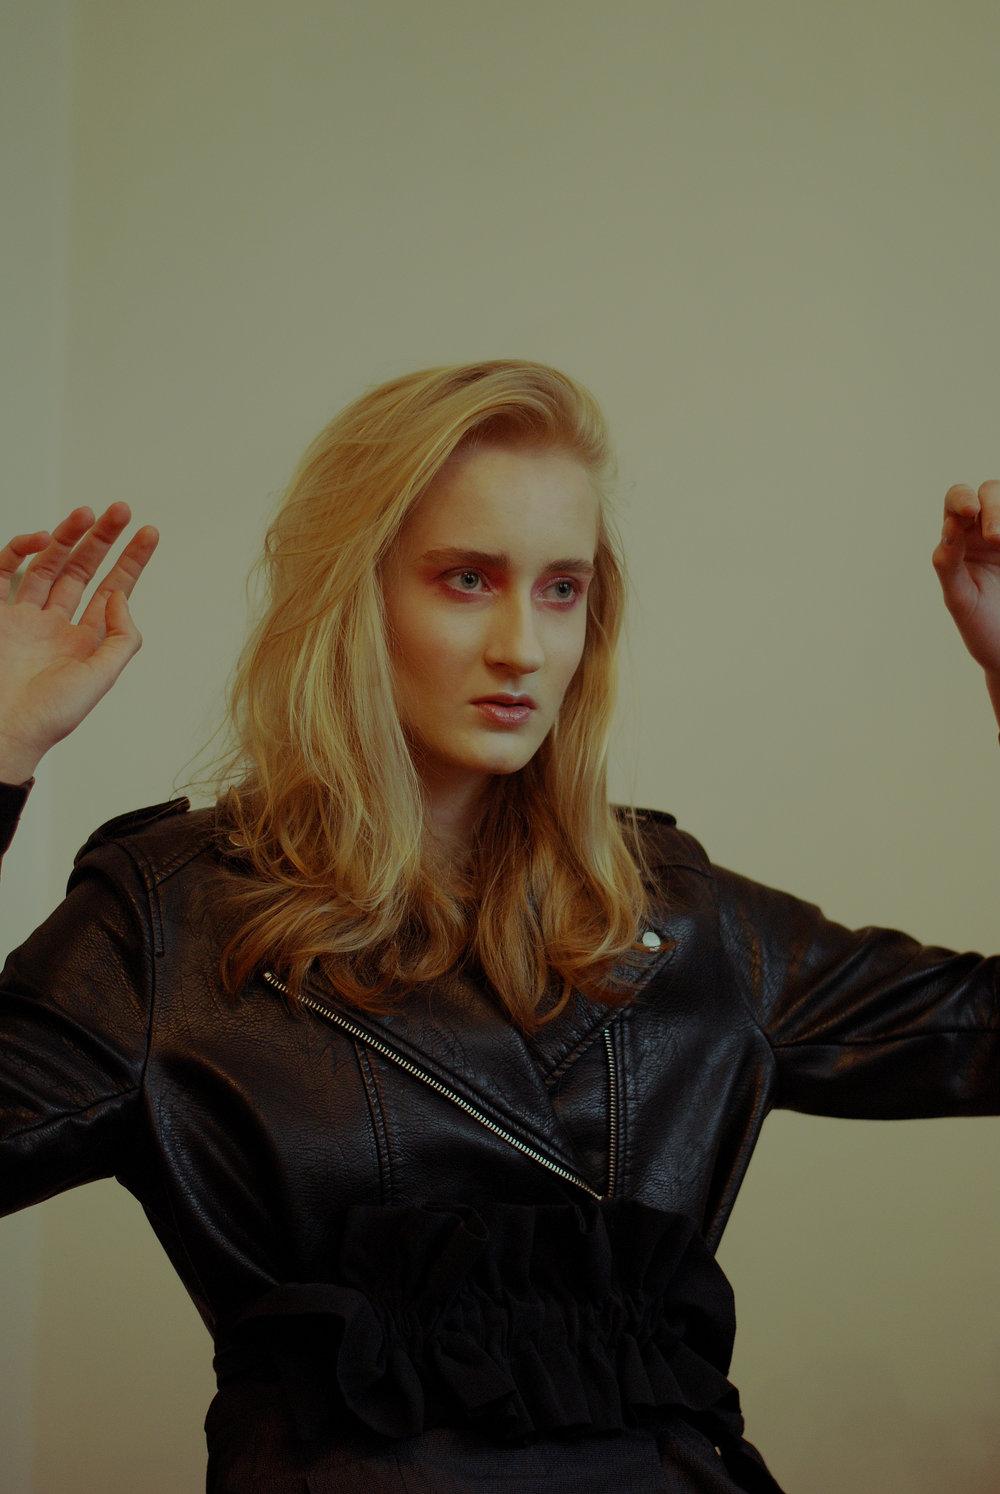 leather jacket ZARA, skirt MMC